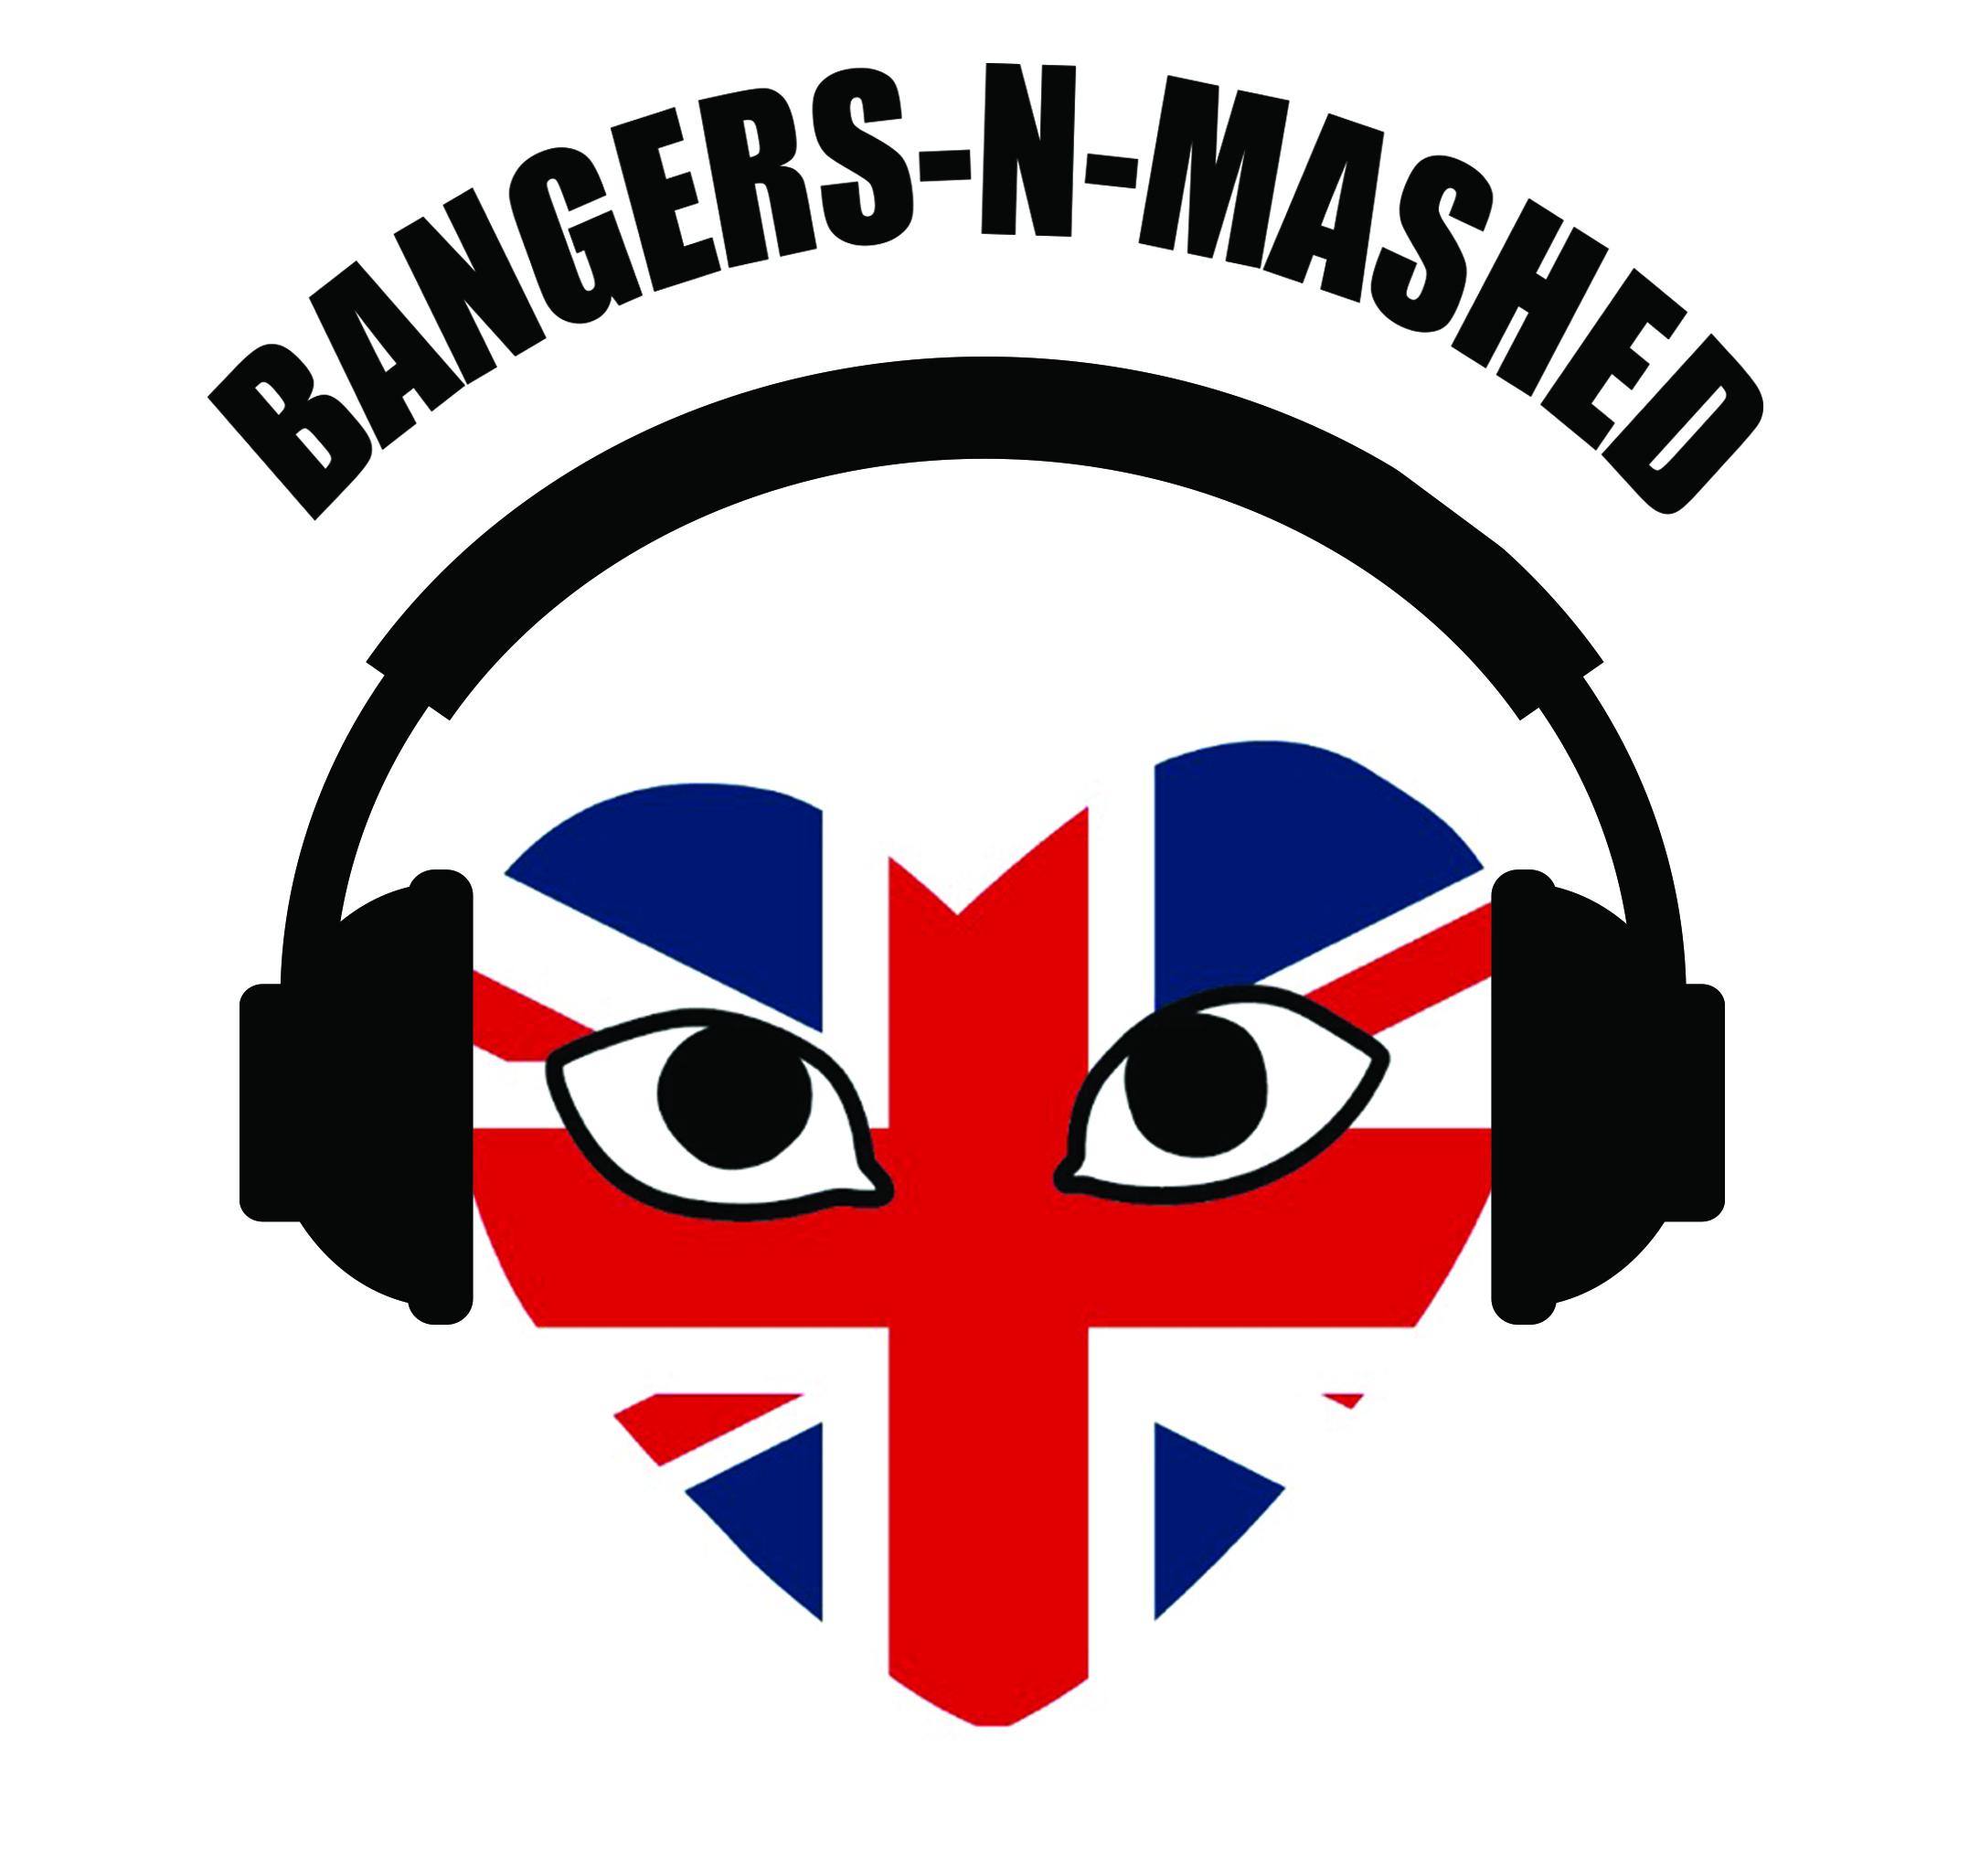 Bangers N Mashed    Mixcloud   /   IG